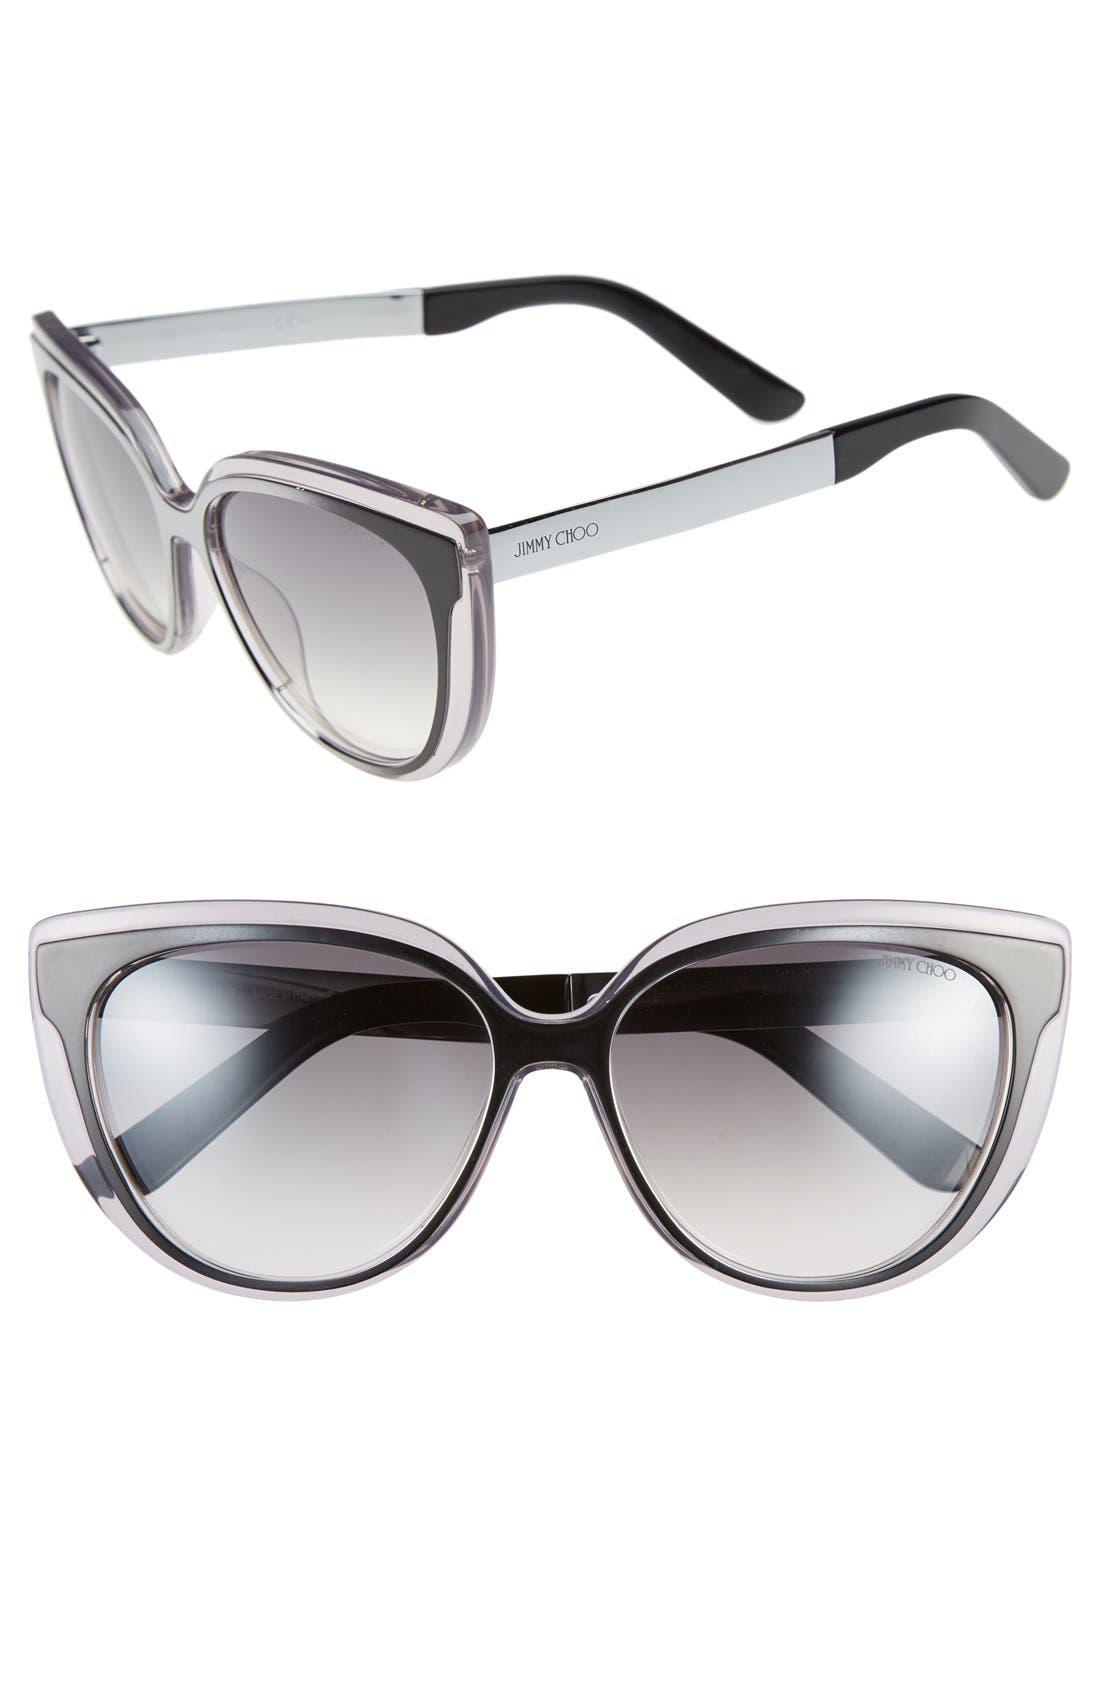 Alternate Image 1 Selected - Jimmy Choo 'Cindy' 57mm Retro Sunglasses